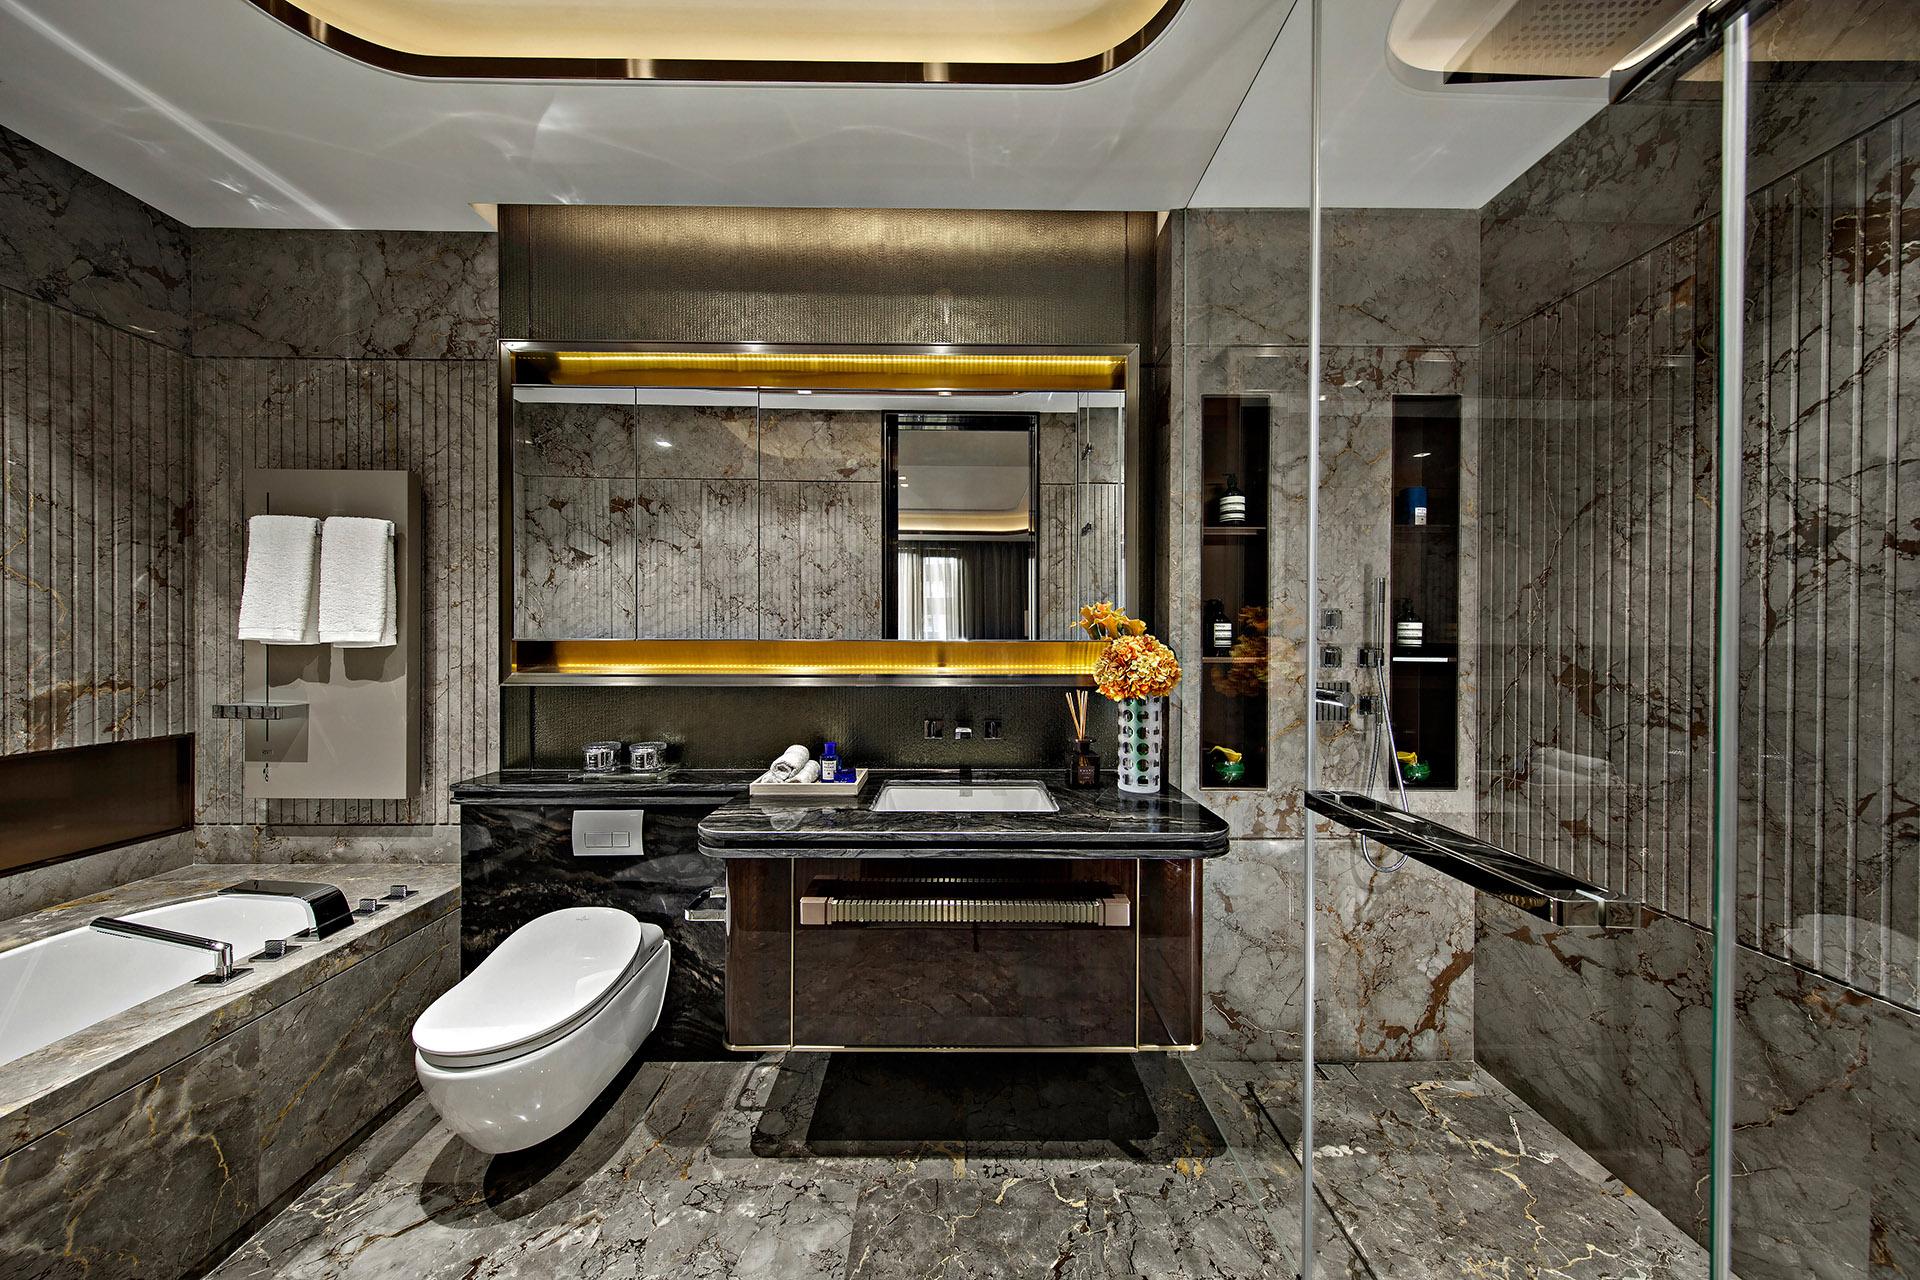 Marble, Bathroom, Bathroom Interiors, Interiors, Luxury Bathroom, China, Shanghai, Design